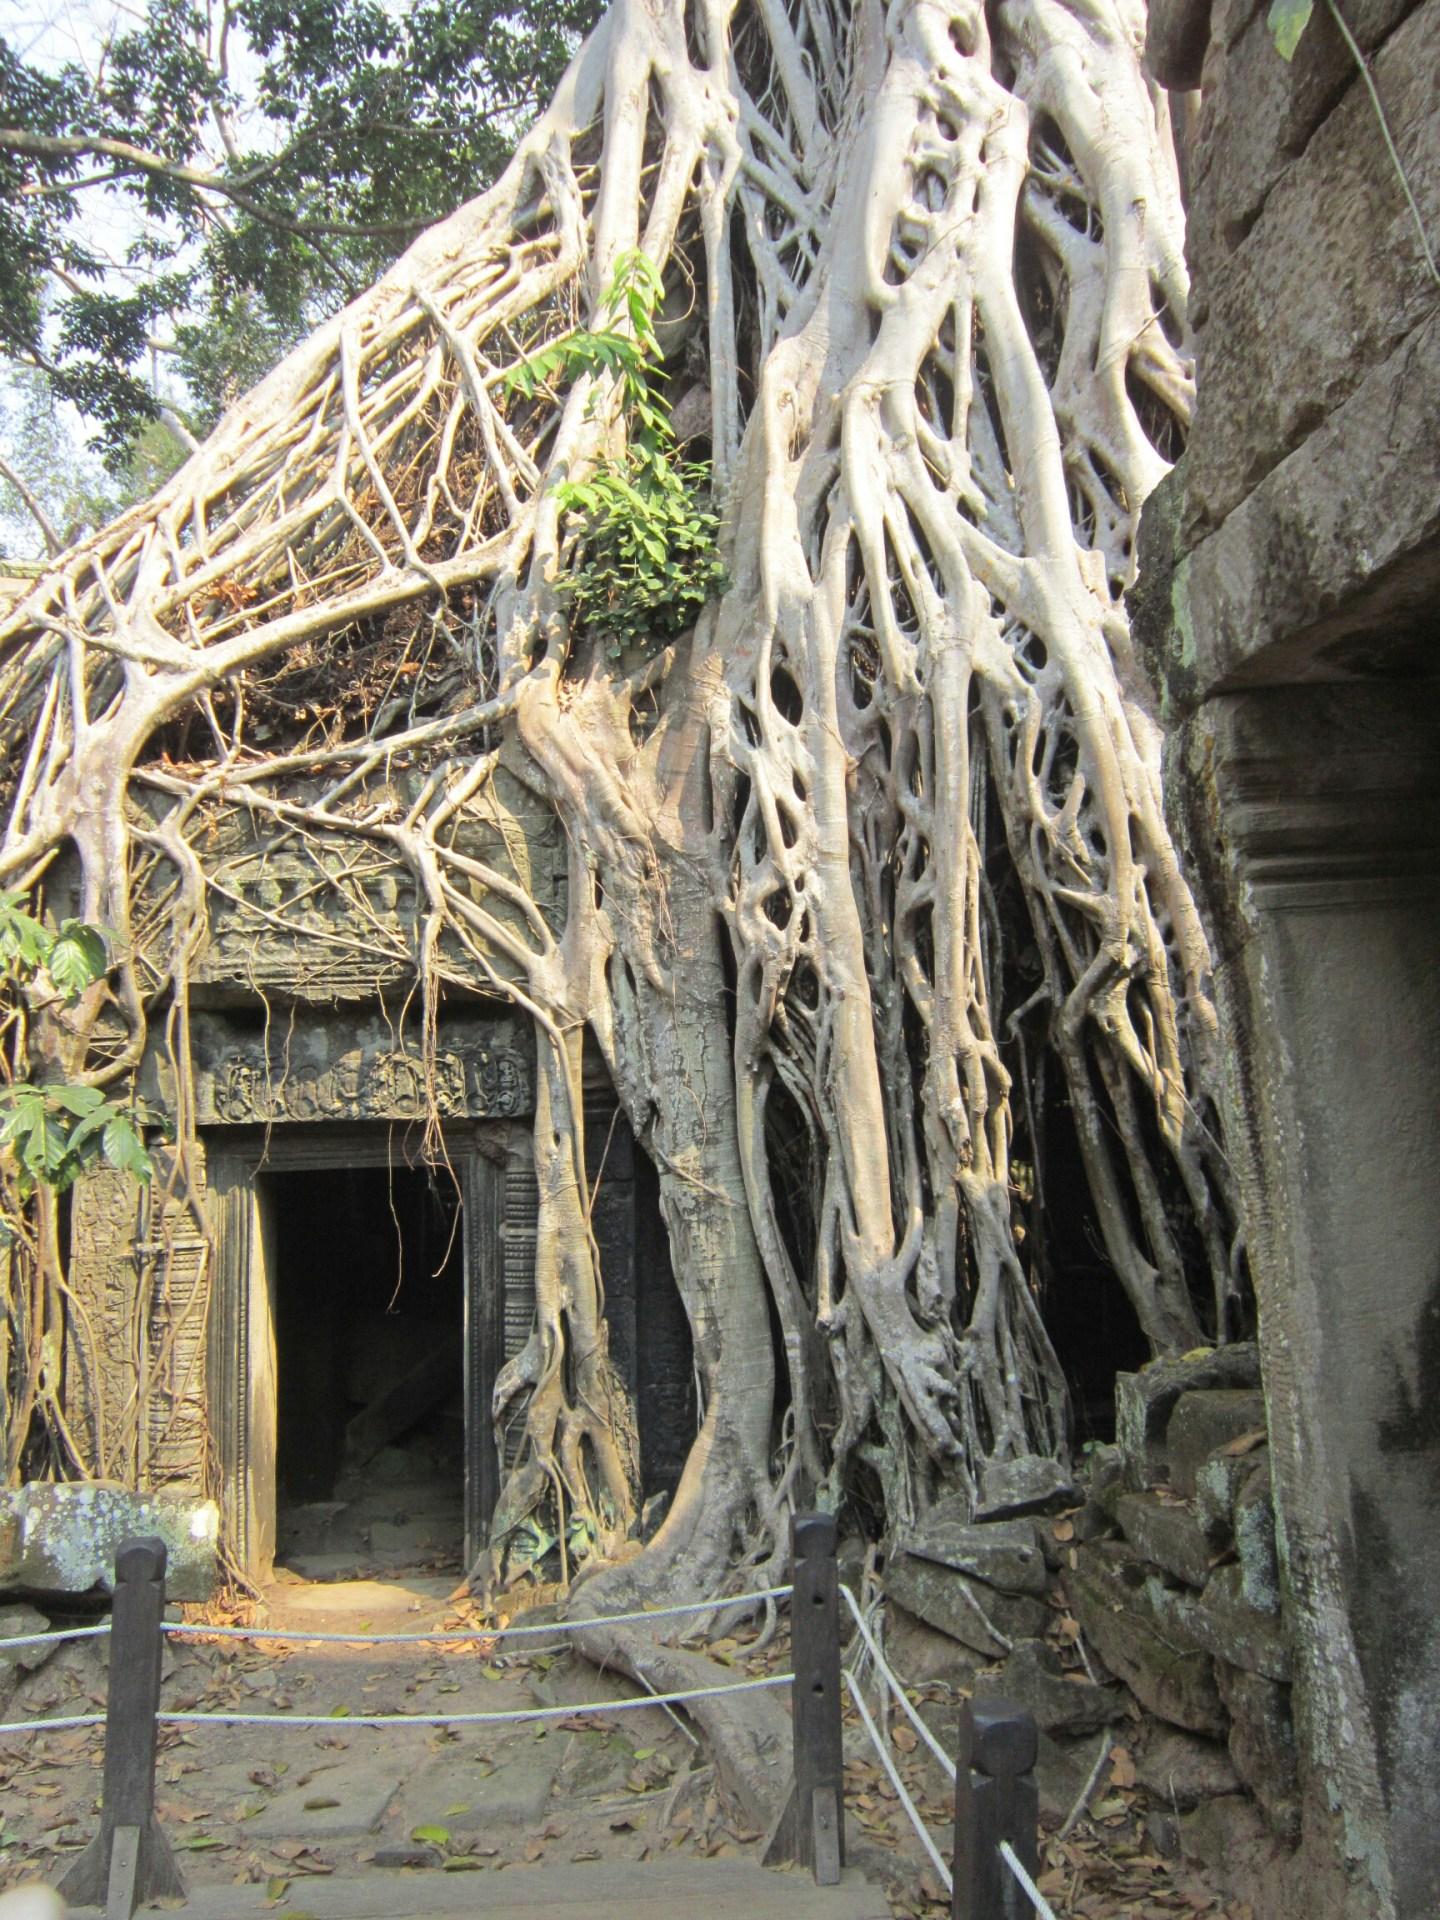 Siem Reap/Angkor – Temples, Ruins, Temples – Cambodia 2016